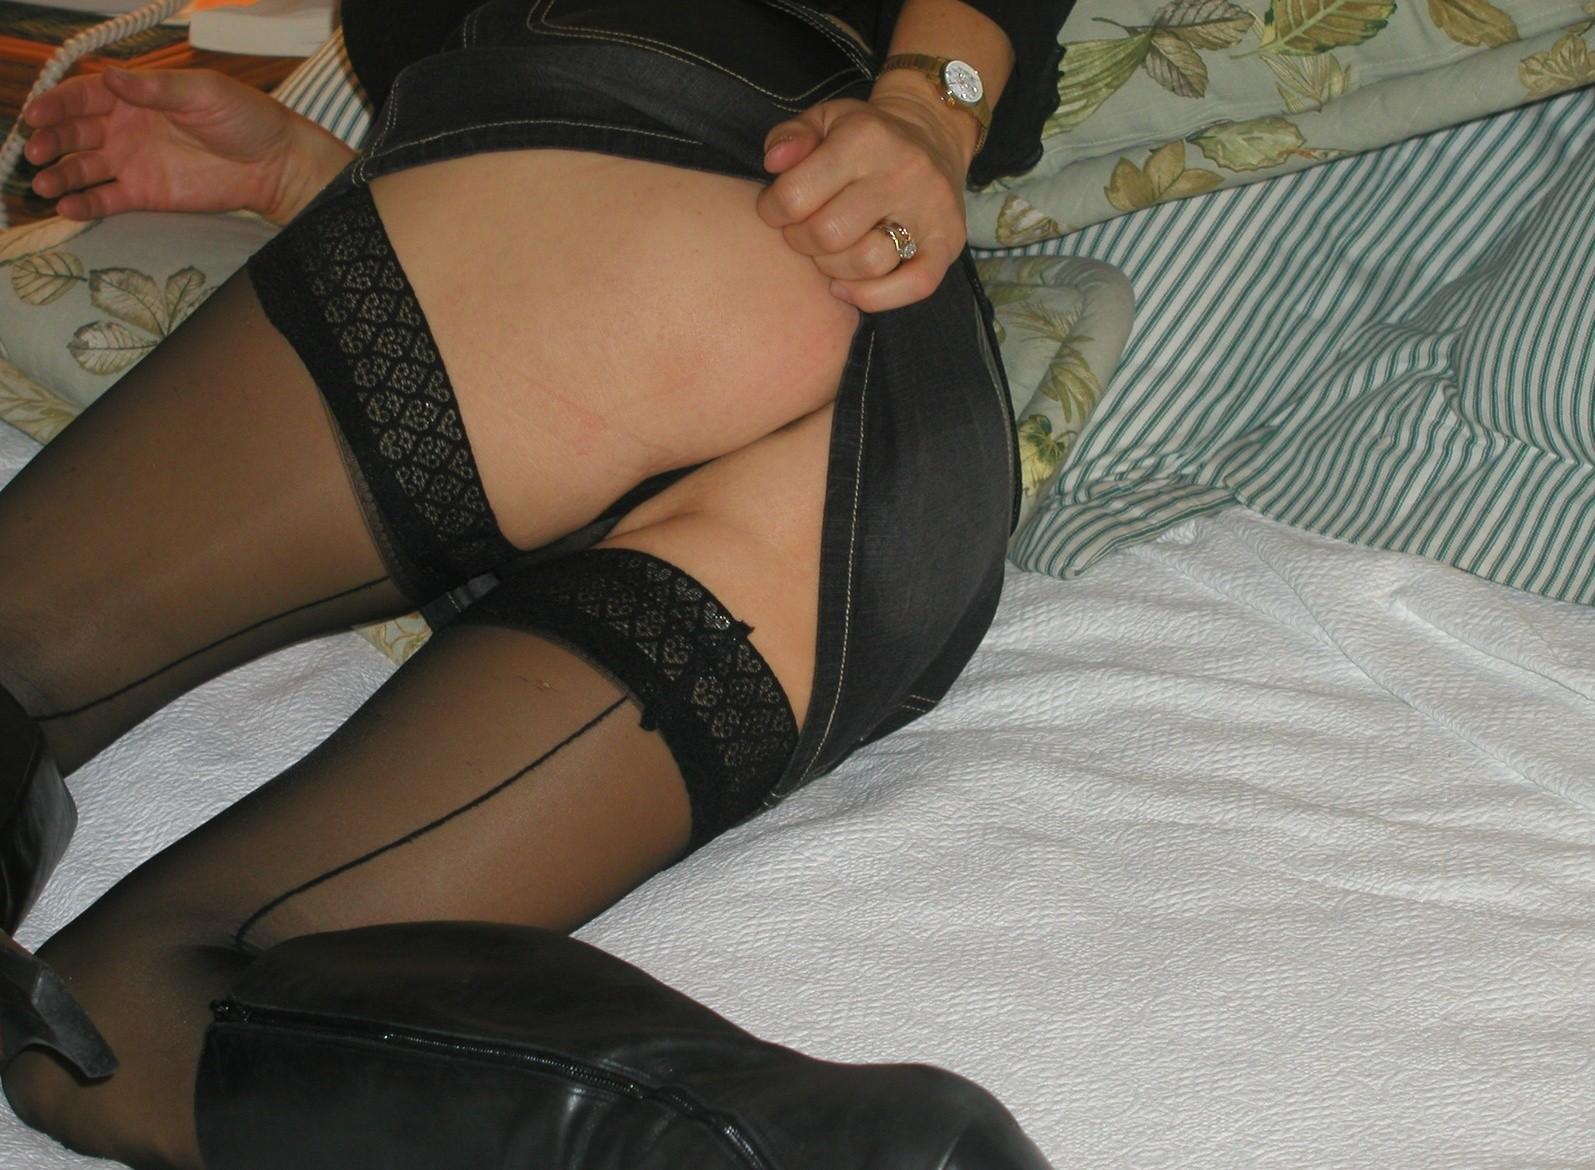 http://pbs-2.adult-empire.com/85/8570/003/pic/3.jpg